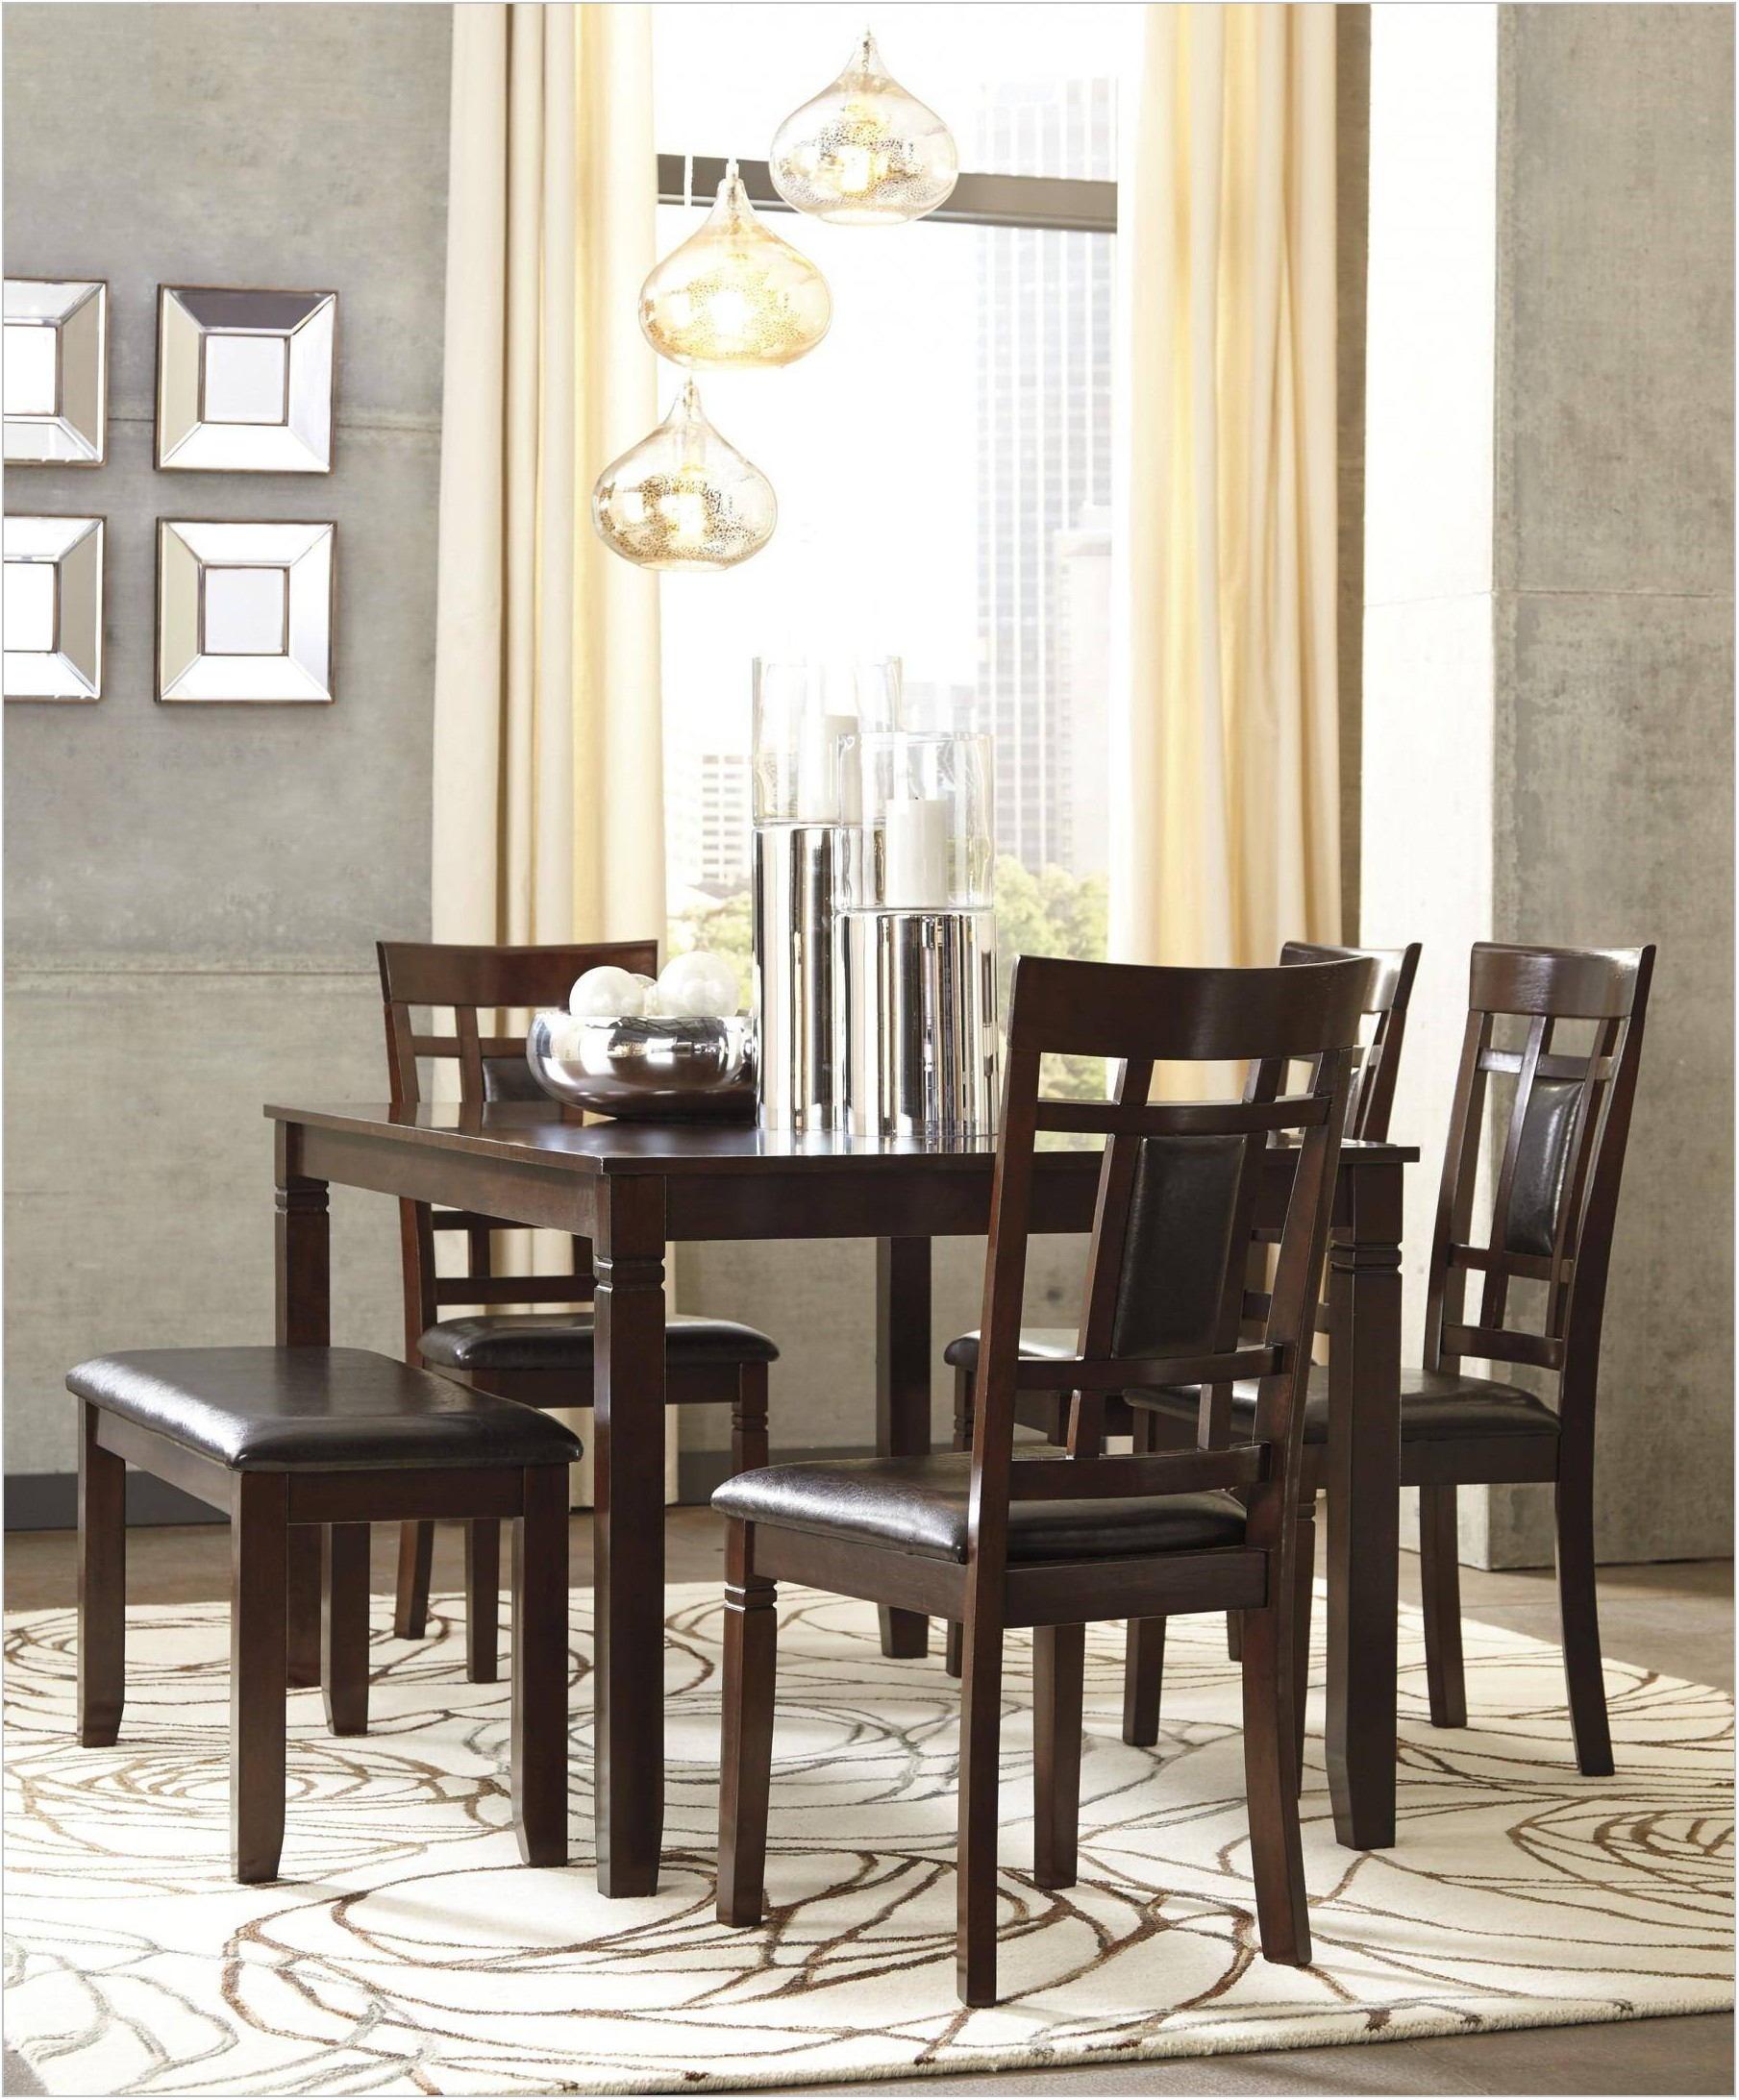 Bennox Dining Room Set